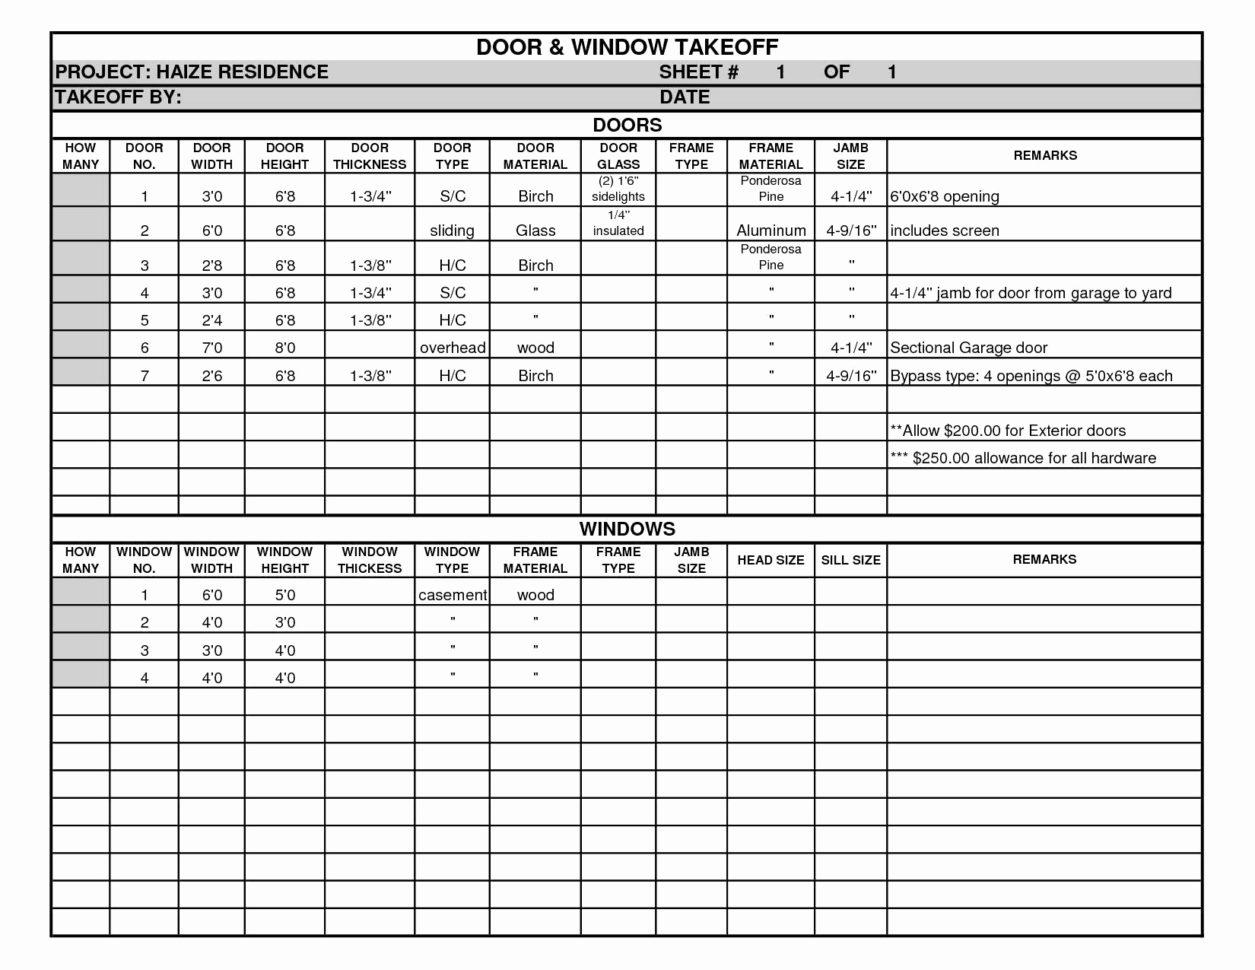 Steel Estimating Spreadsheet Inspirational Structural Steel Takeoff Intended For Steel Takeoff Spreadsheet